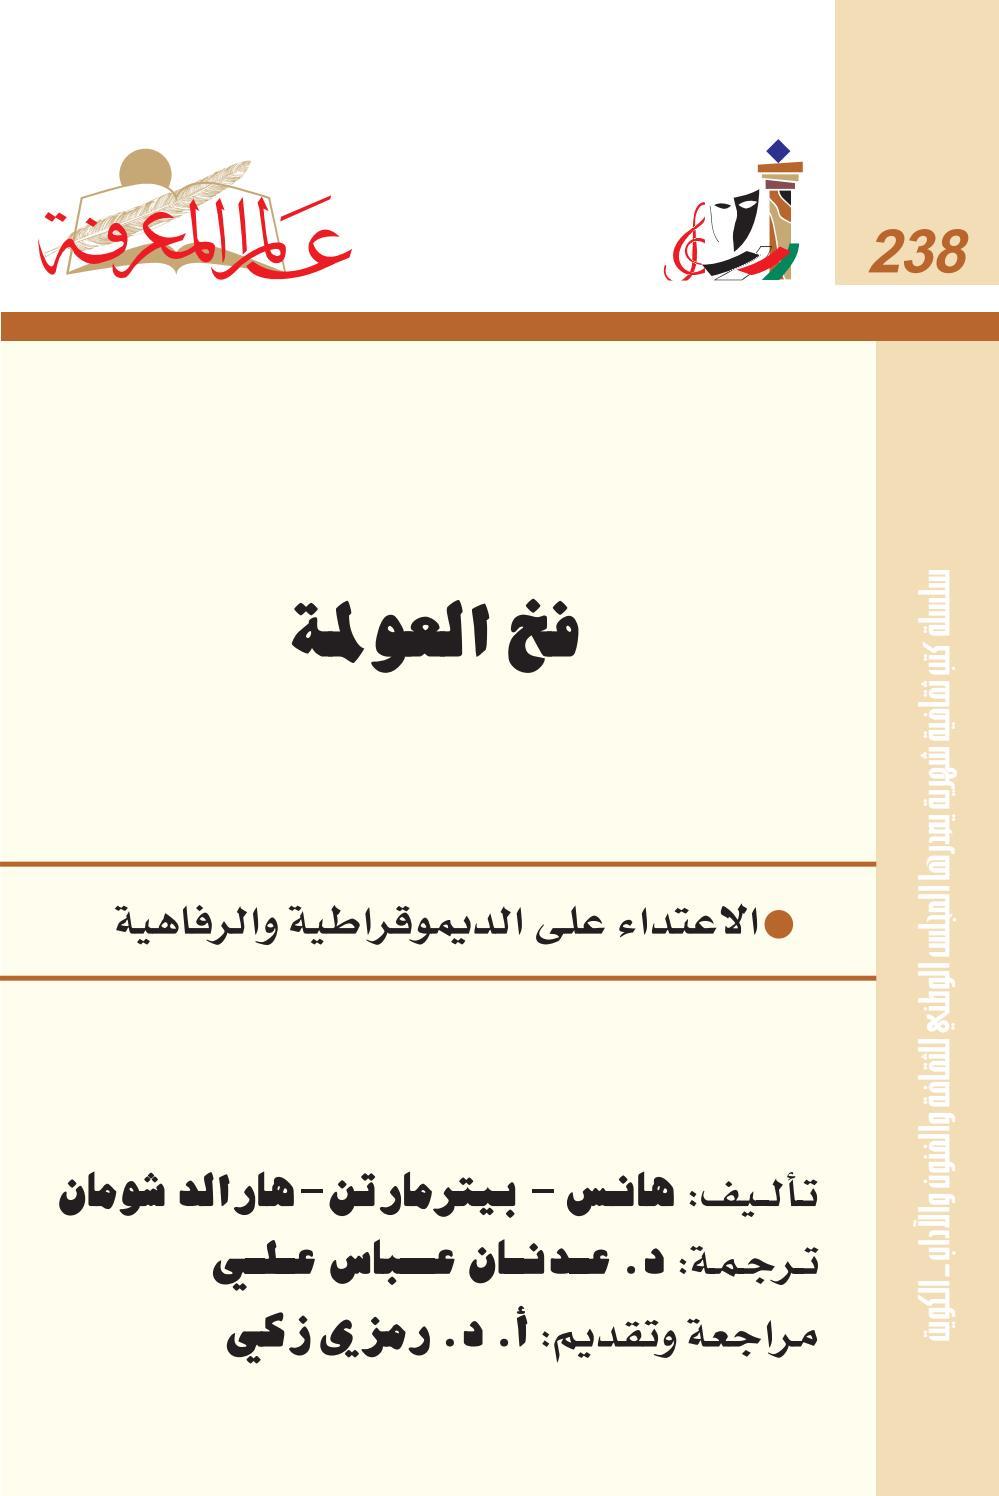 c19d6994002fb 238 فخ العولمة by iReadPedia - issuu